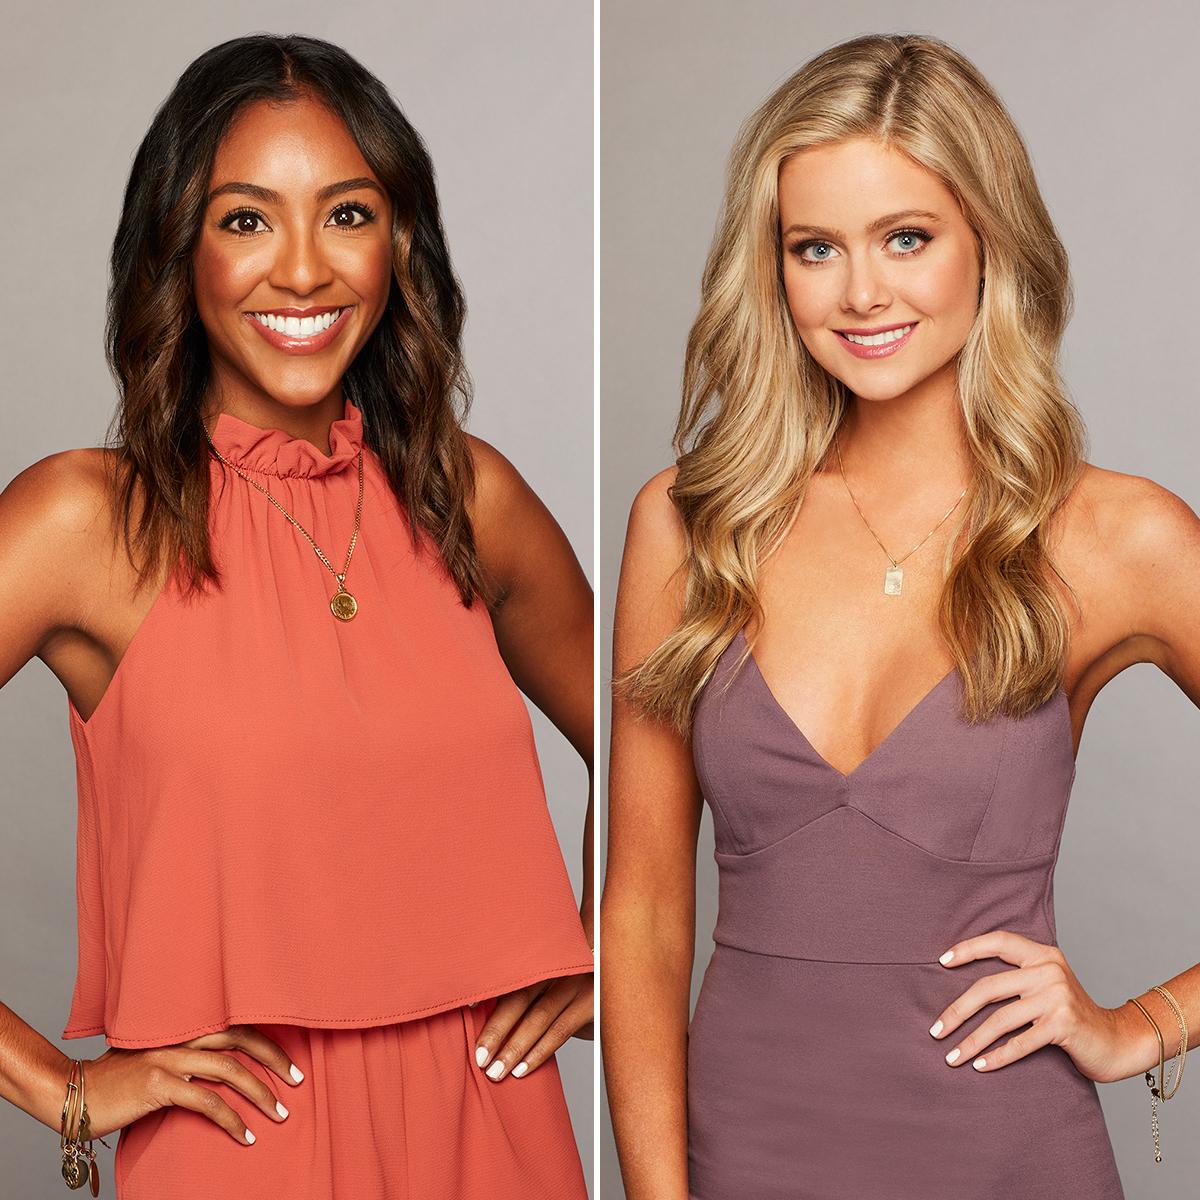 The-Bachelor's-Tayshia-Adams-and-Hannah-Godwin-Share-Updates-Post-Colton